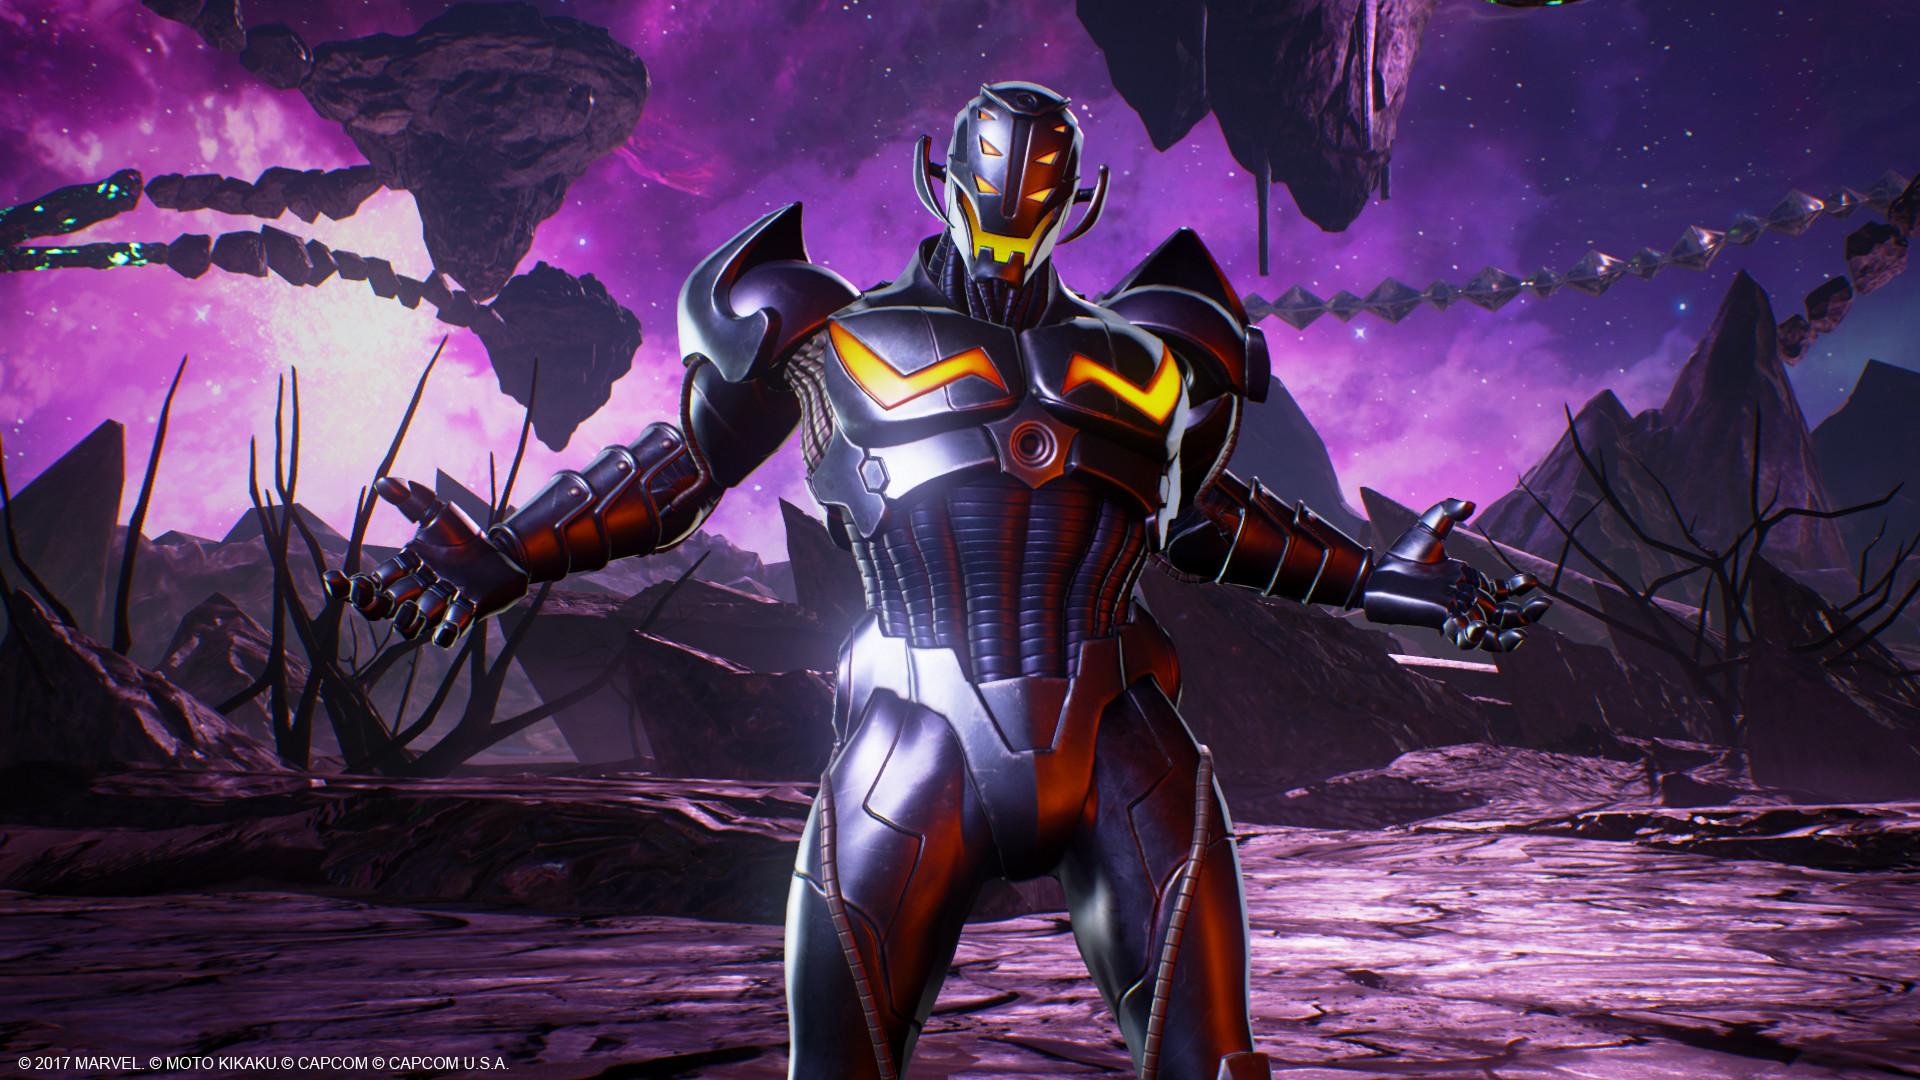 Marvel Vs Capcom Infinite Ultron Conquest Costume On Steam